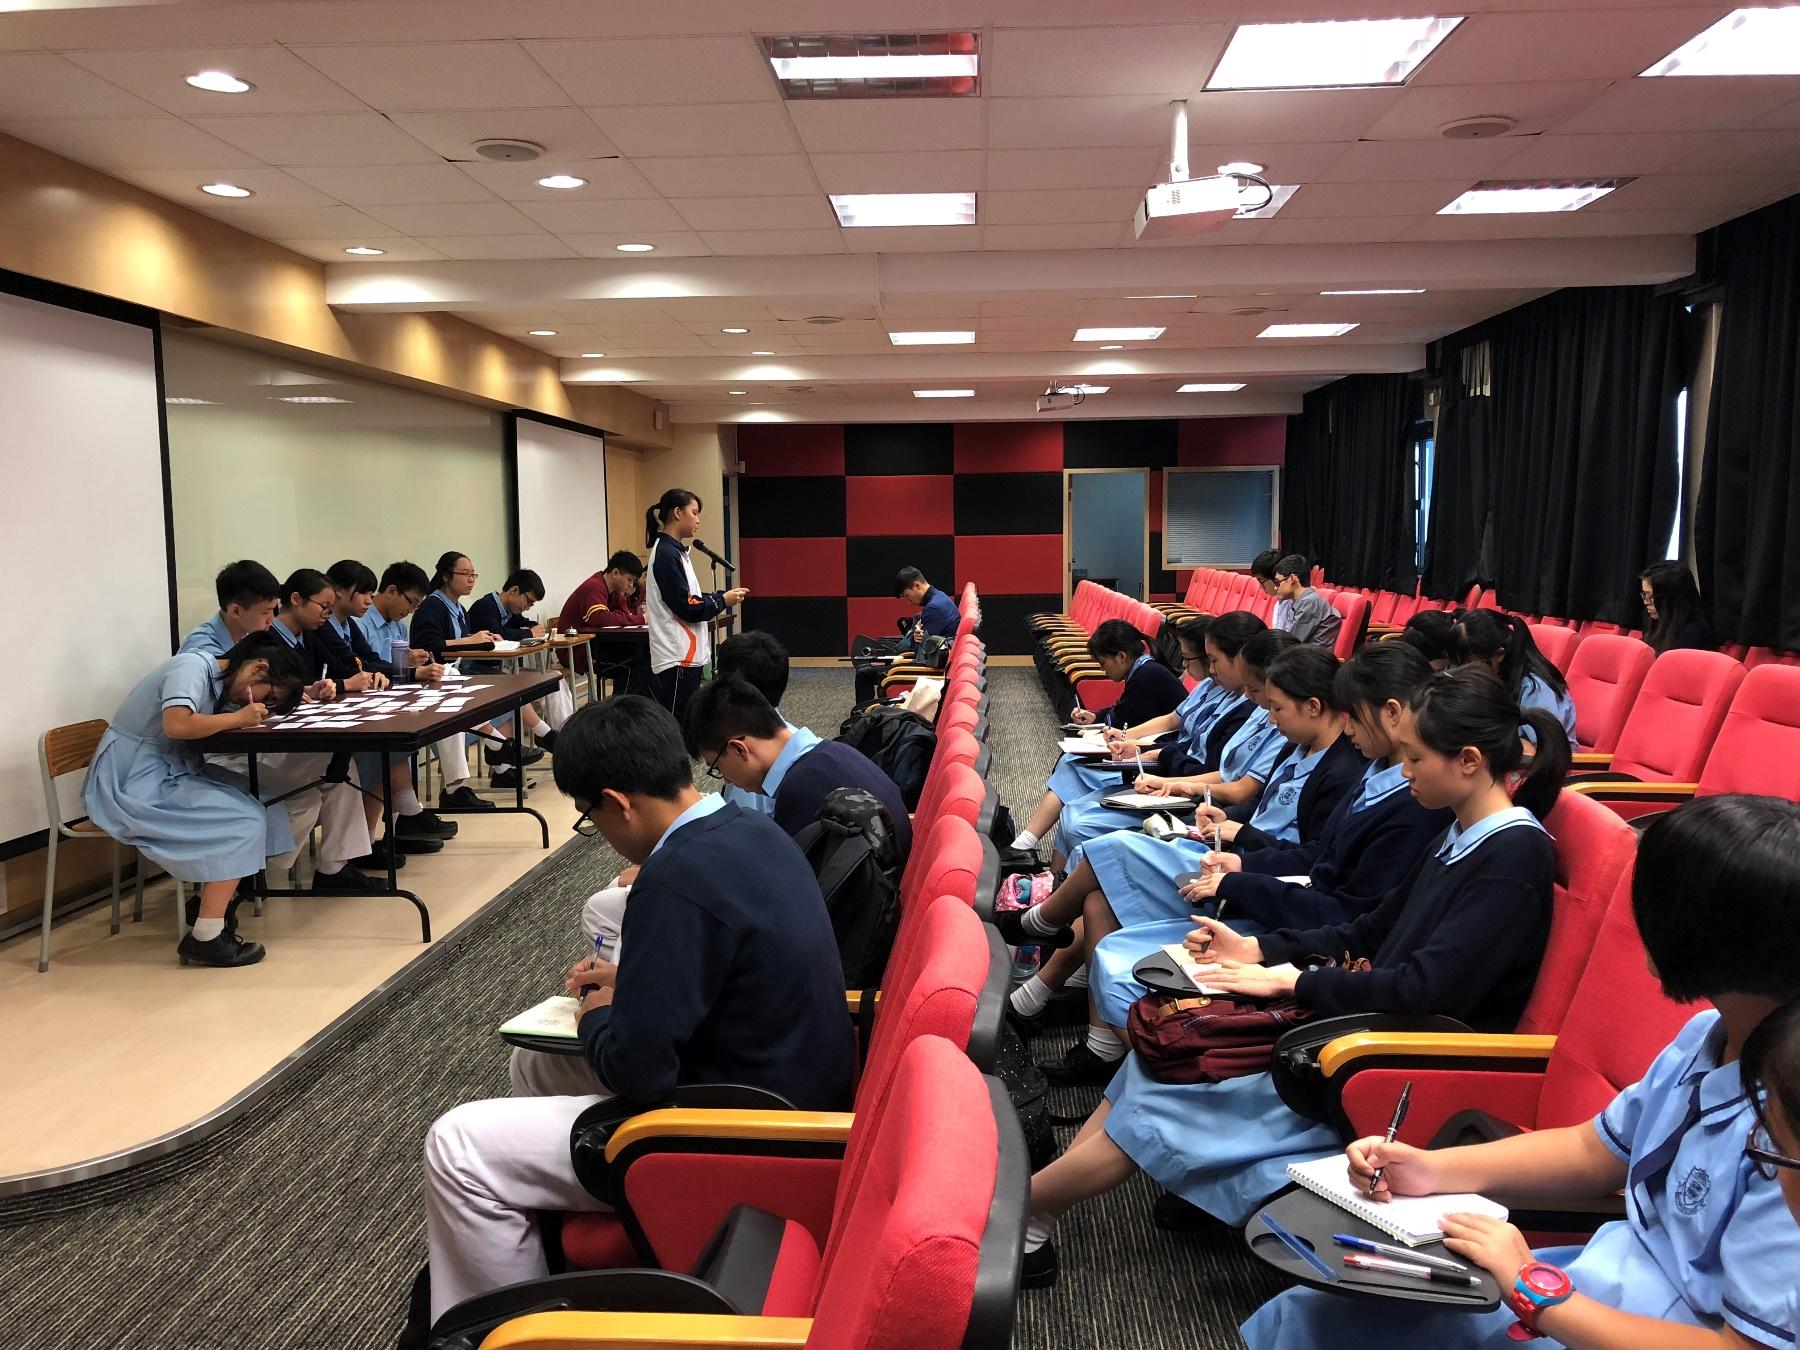 http://www.npc.edu.hk/sites/default/files/1_1412.jpg